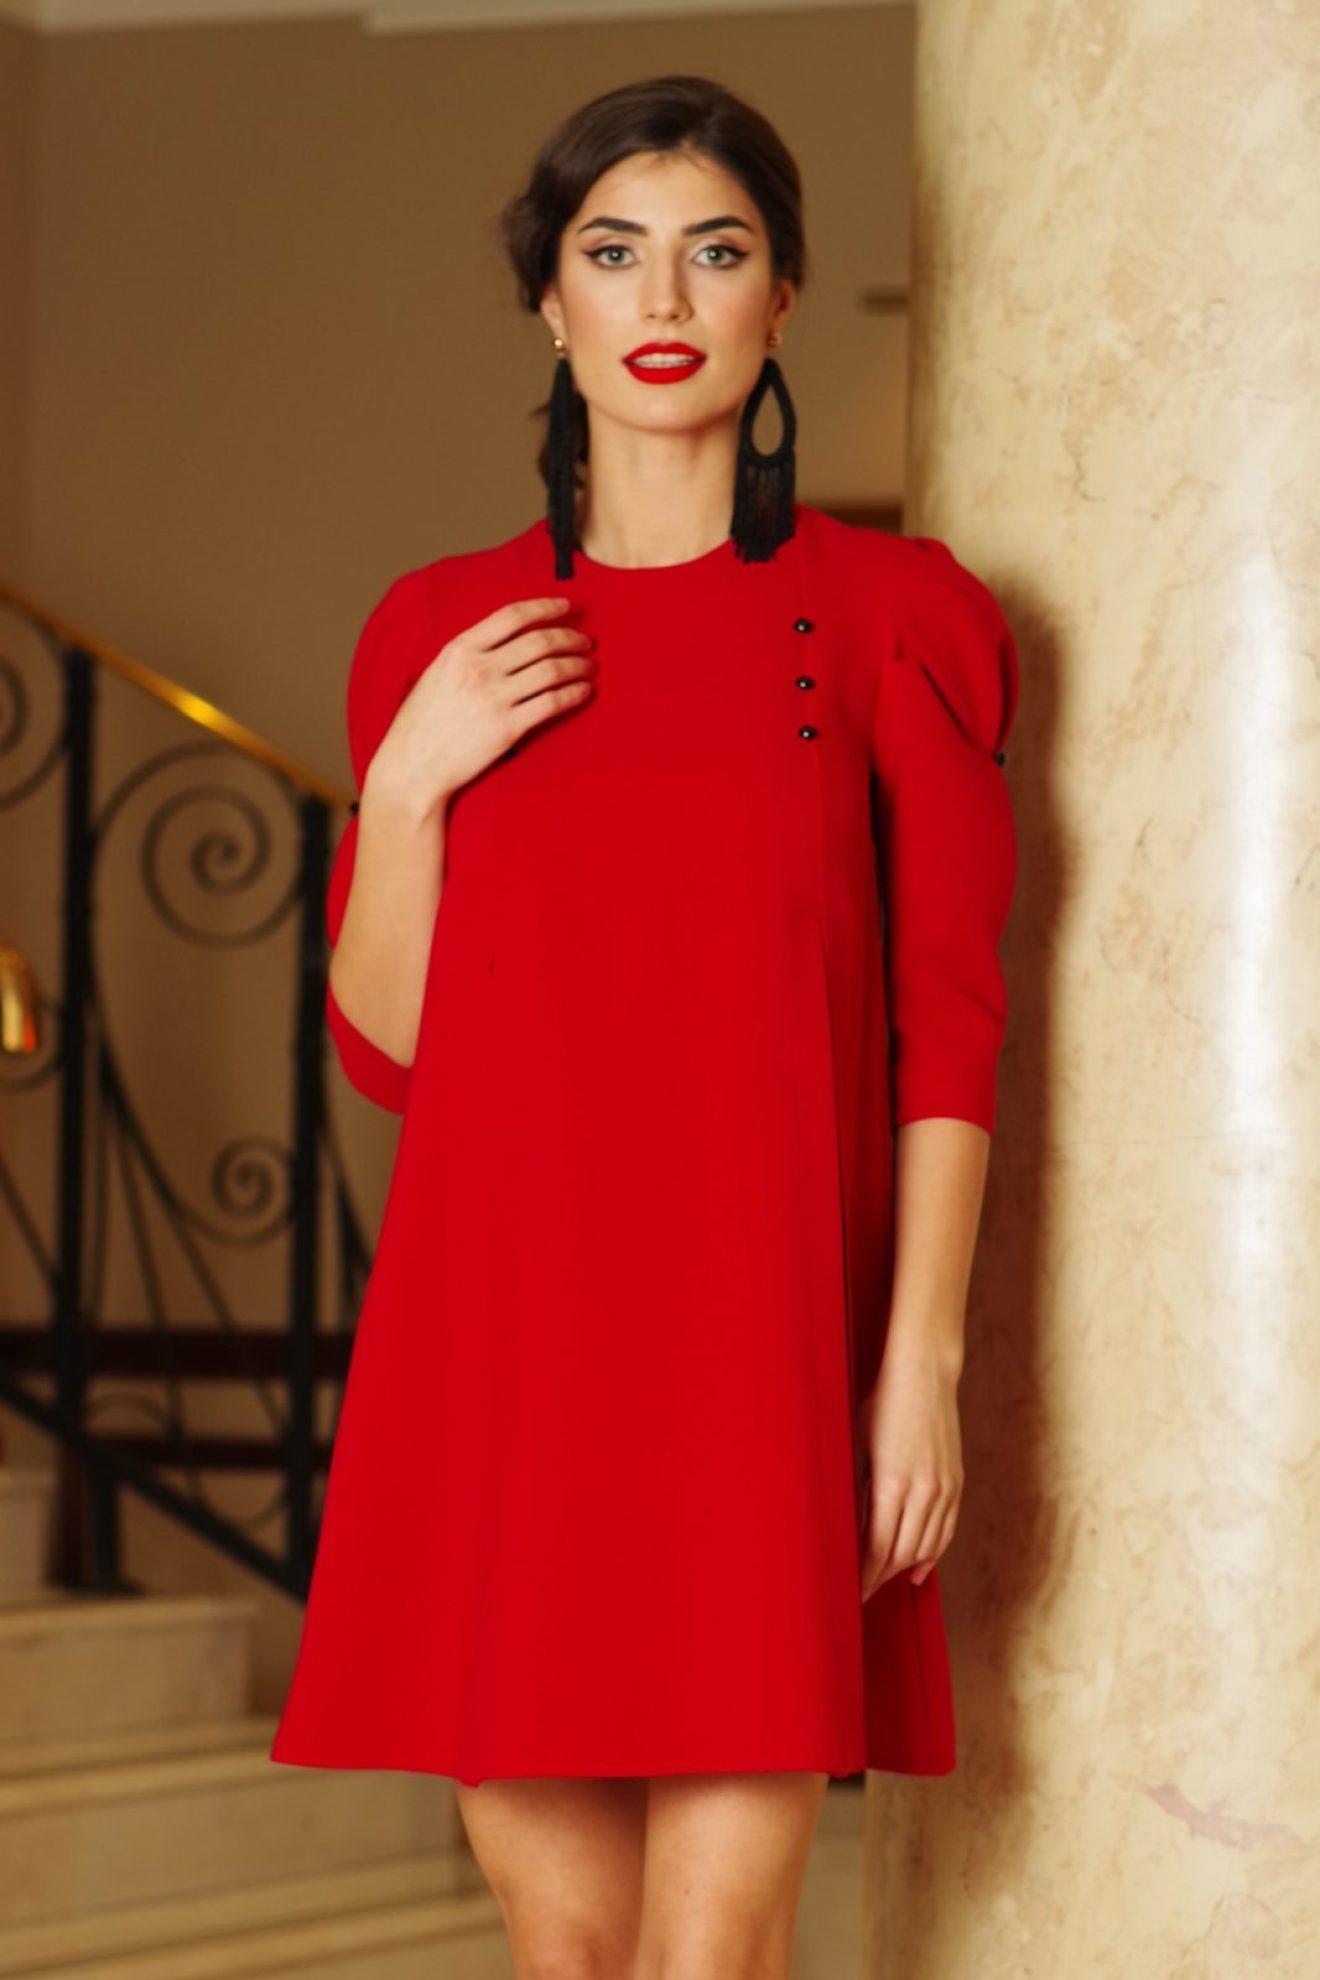 Rochie Artista rosie de zi cu croi larg cu maneci trei-sferturi din stofa usor elastica accesorizata cu nasturi